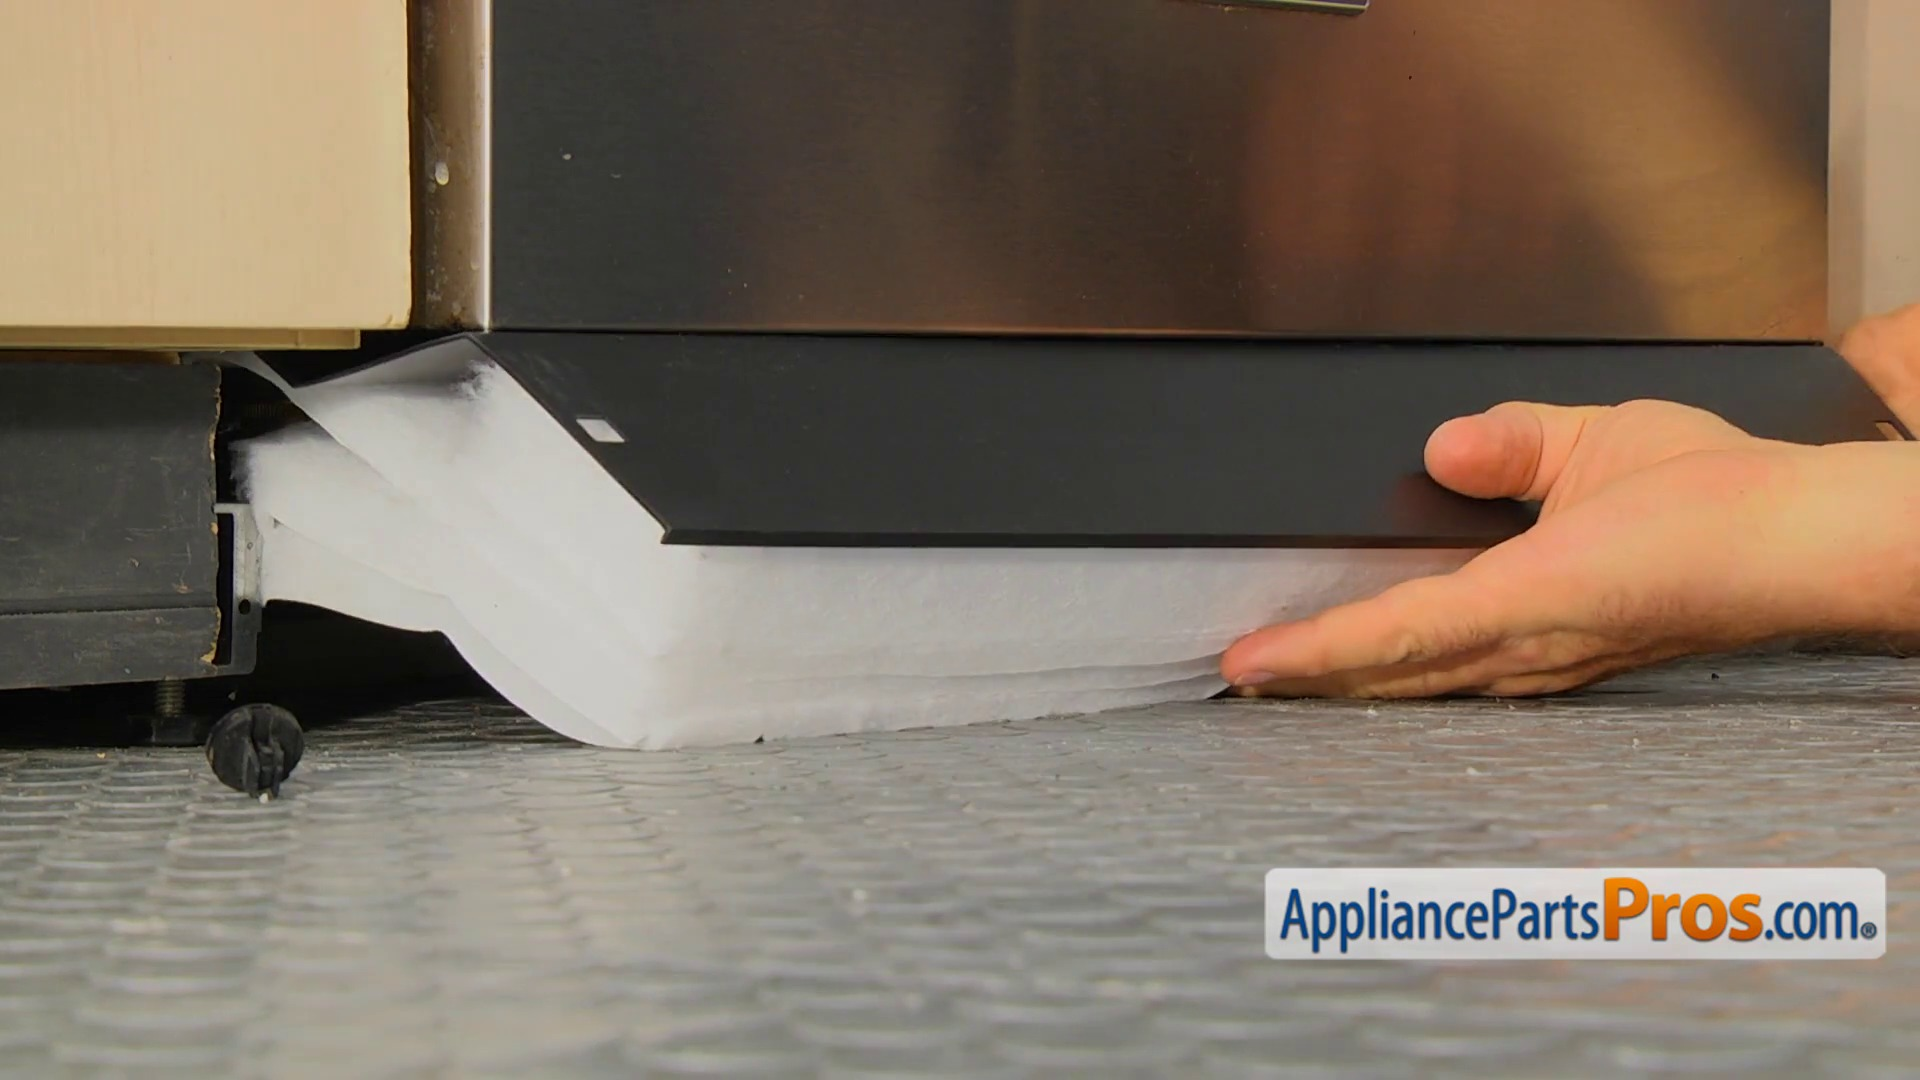 Attractive Whirlpool WPW10526114 Access Panel - AppliancePartsPros.com EK02